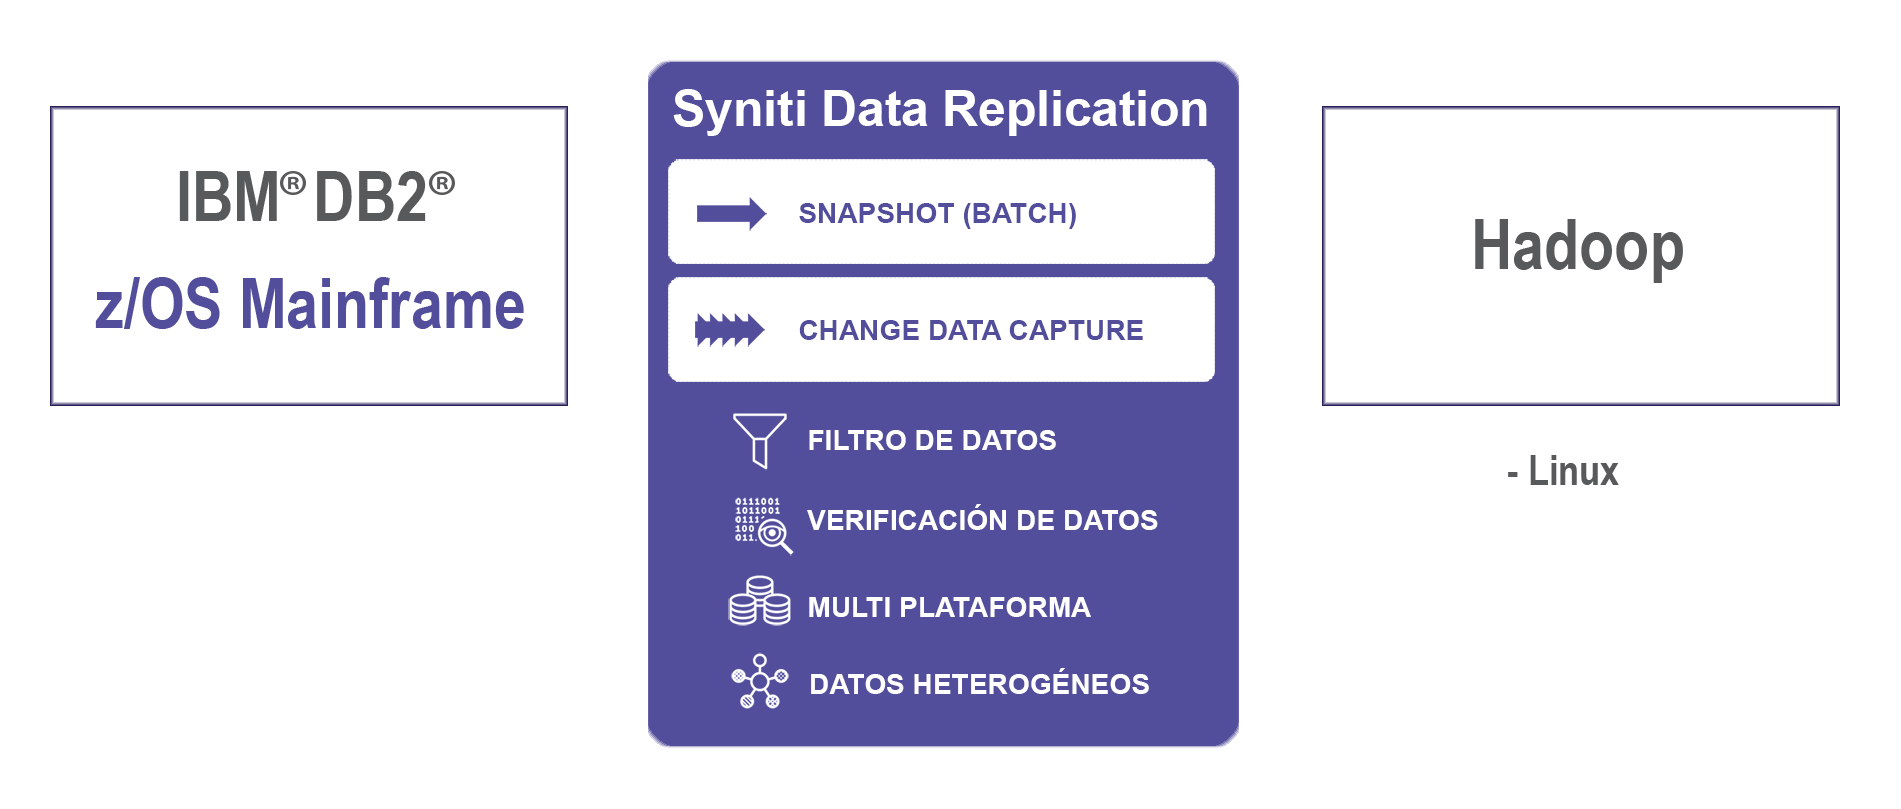 Replicación de datos Db2 z/OS a Hadoop